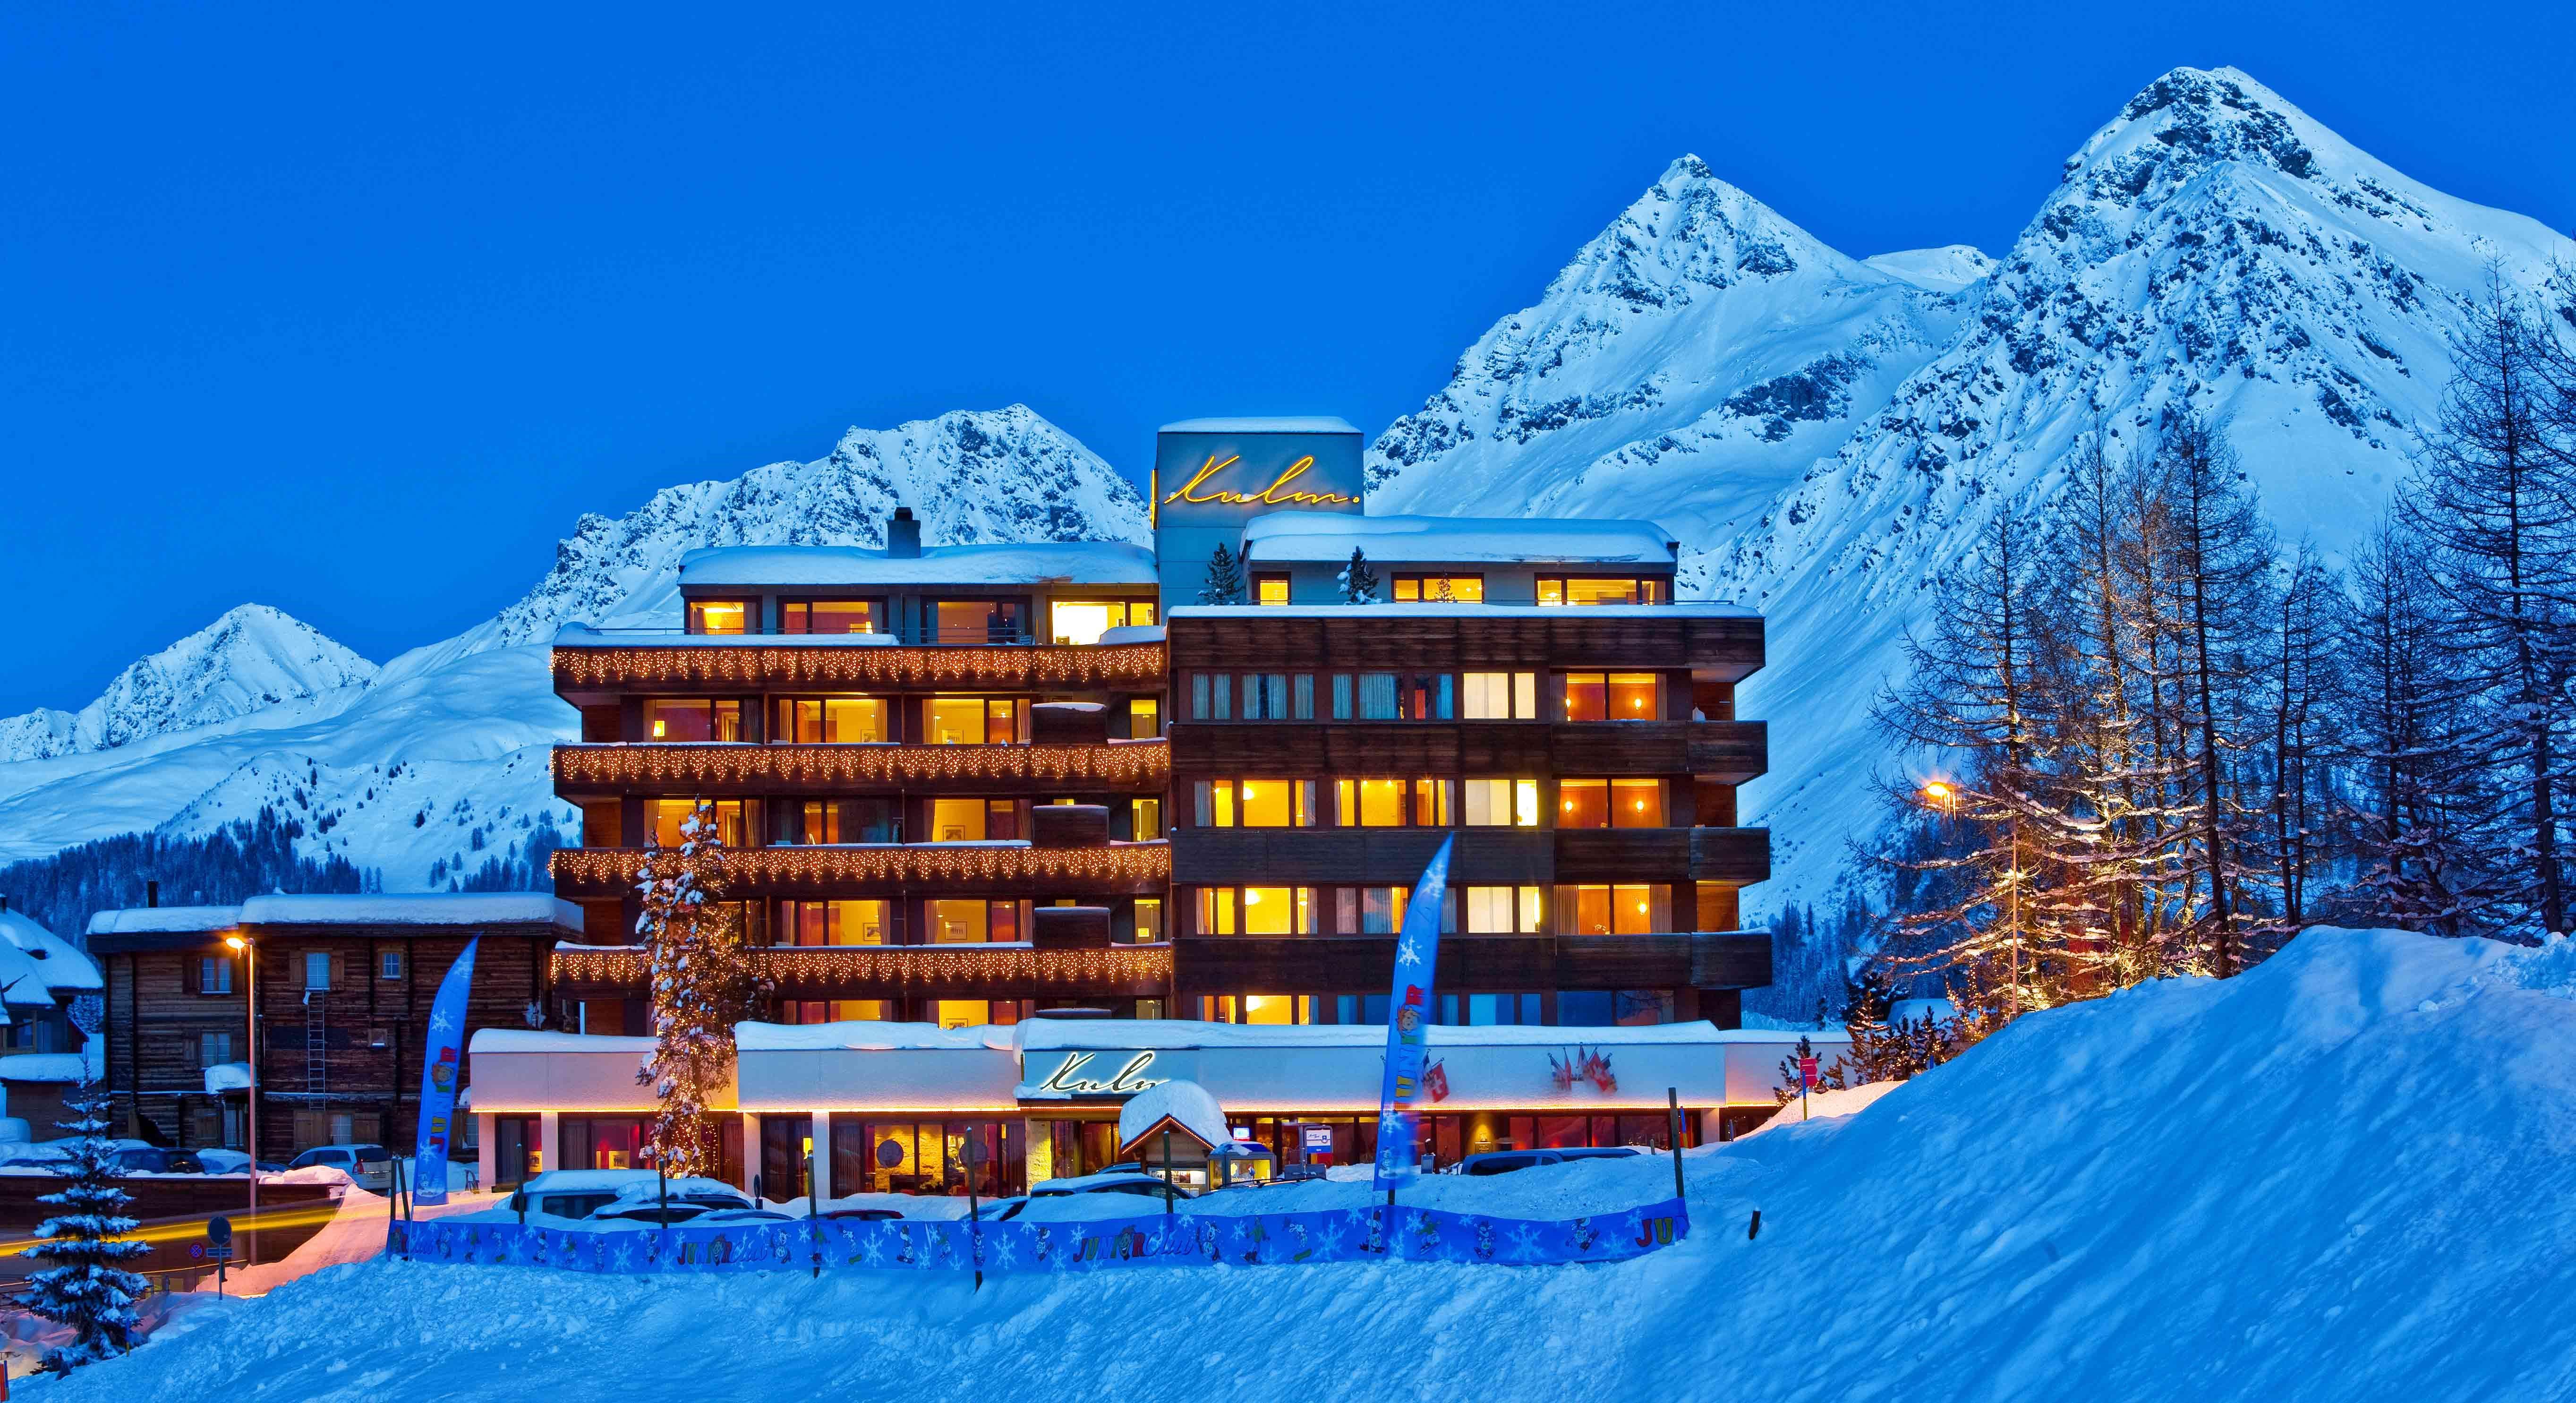 Kulm Hotel Arosa - Arosa